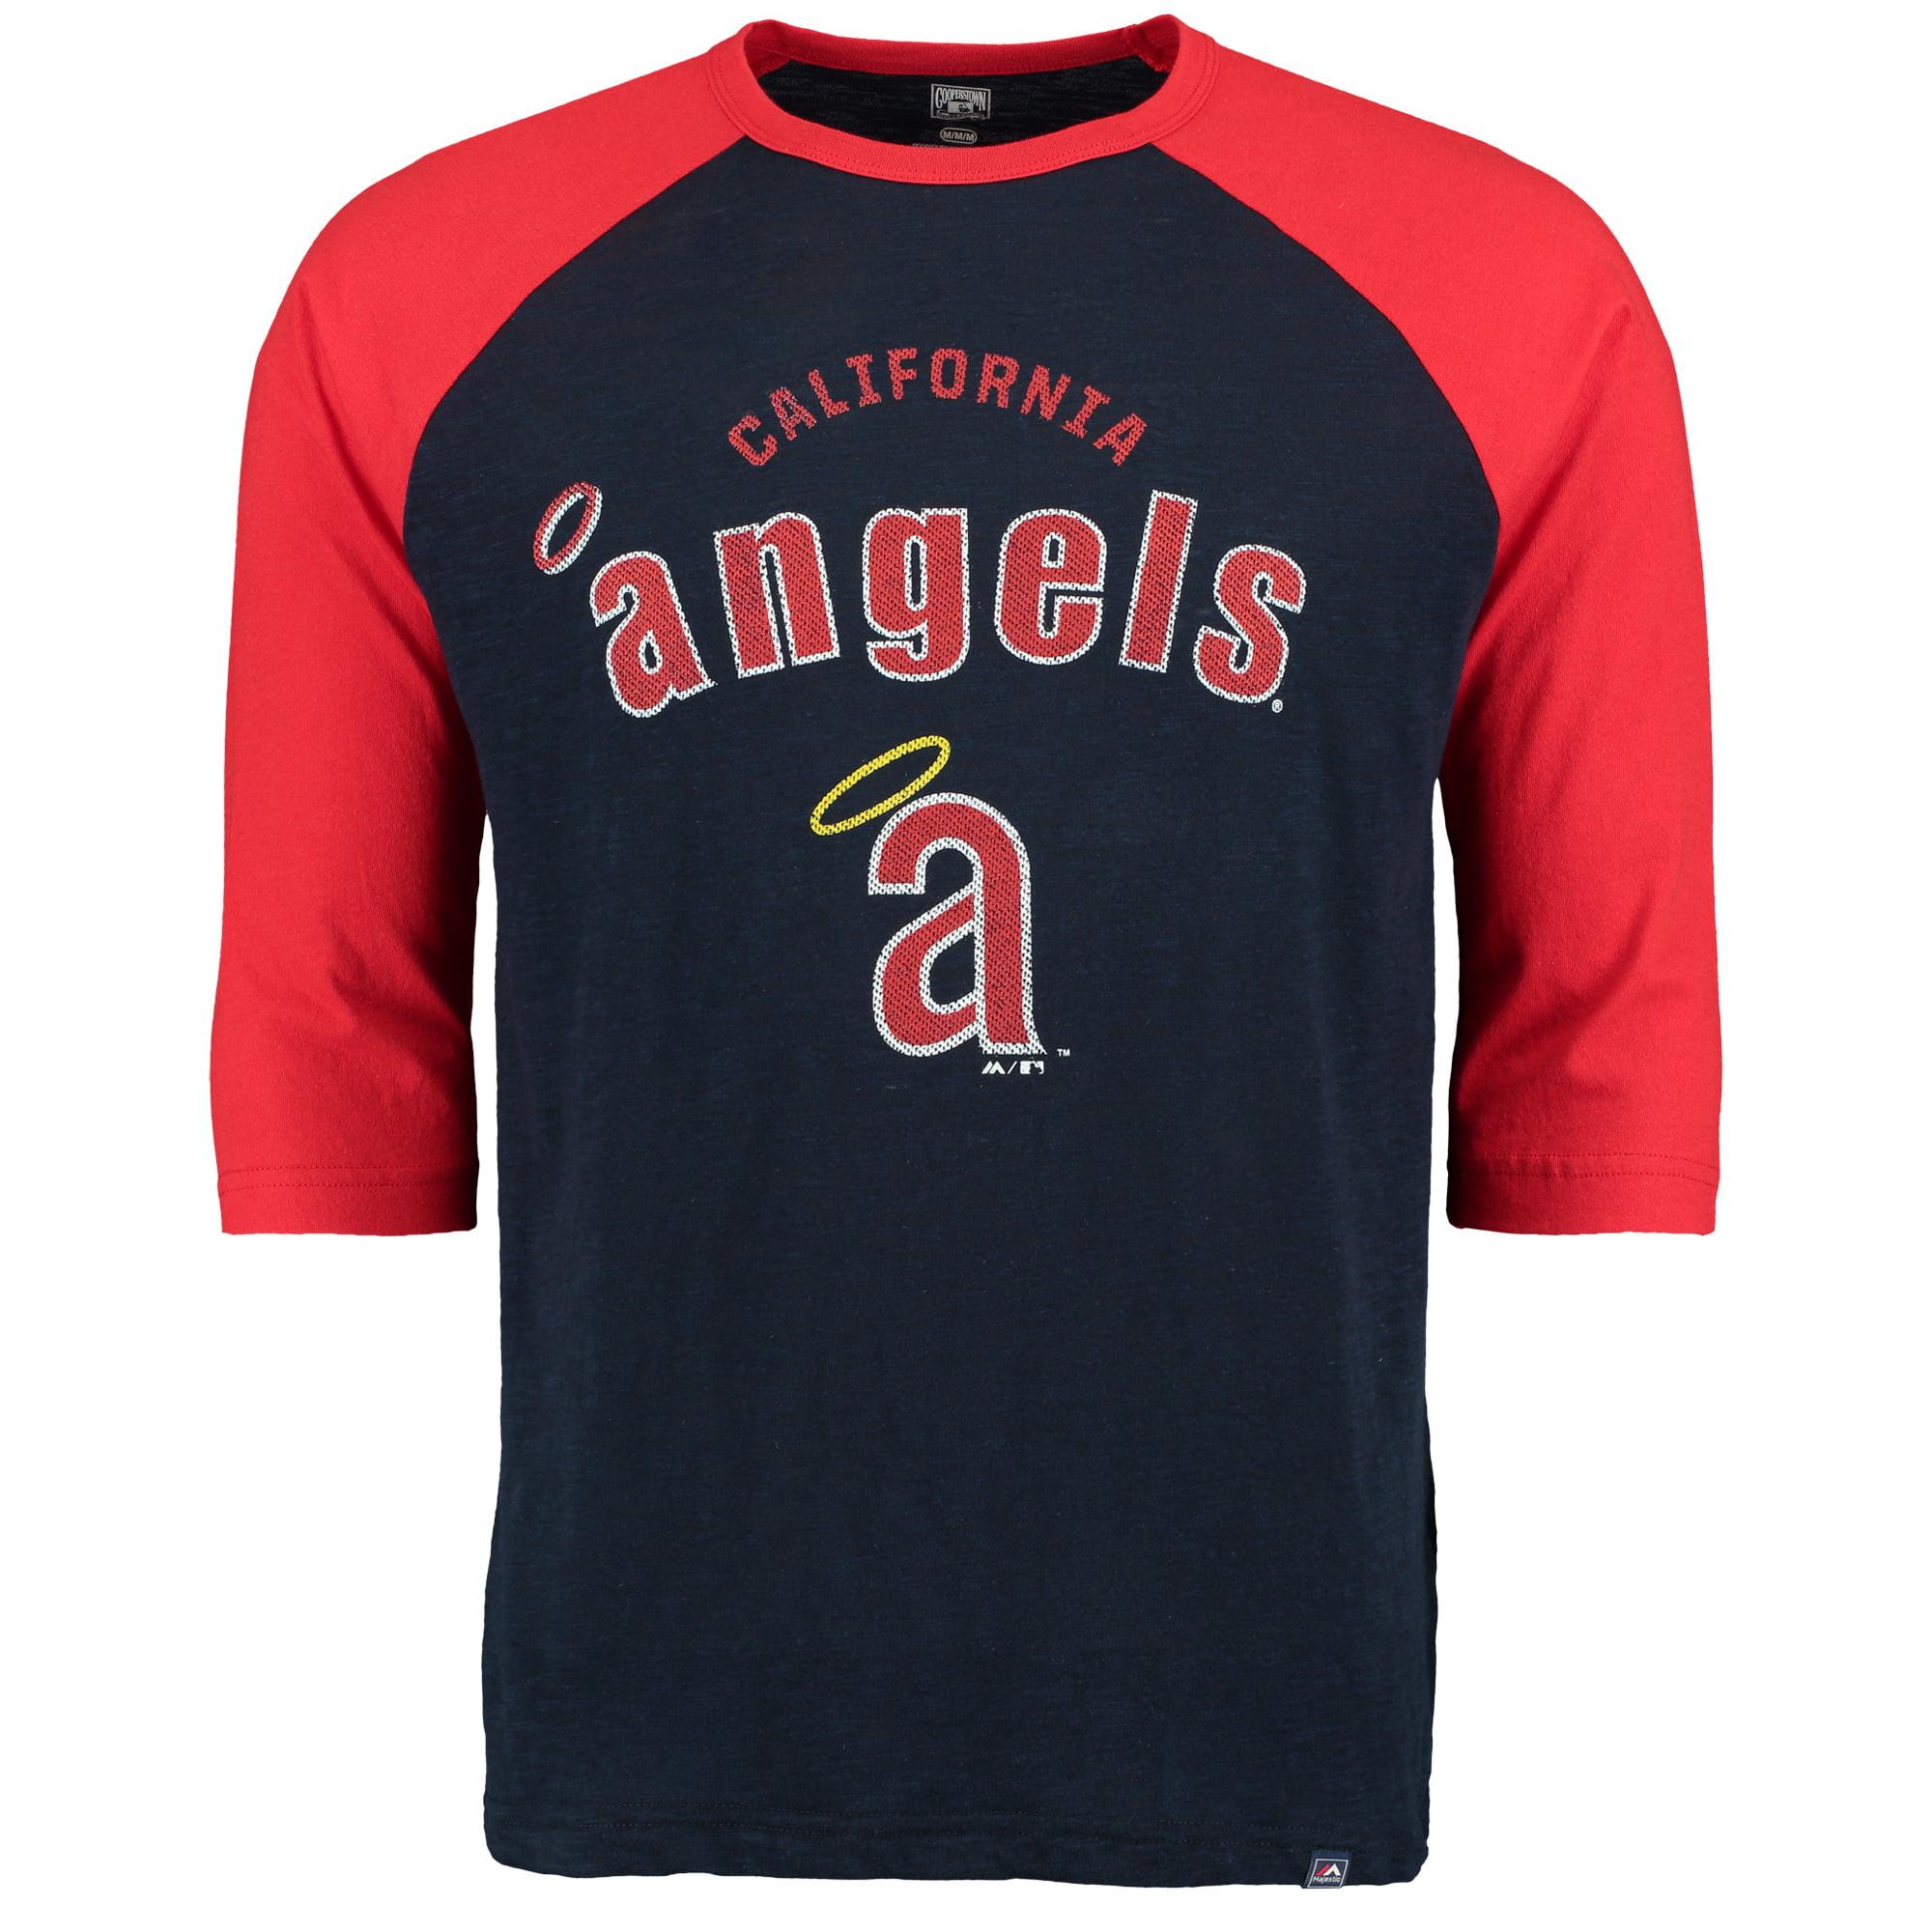 California Angels Majestic Don't Judge Cooperstown Three-Quarter Sleeve Raglan T-Shirt - Navy/Red